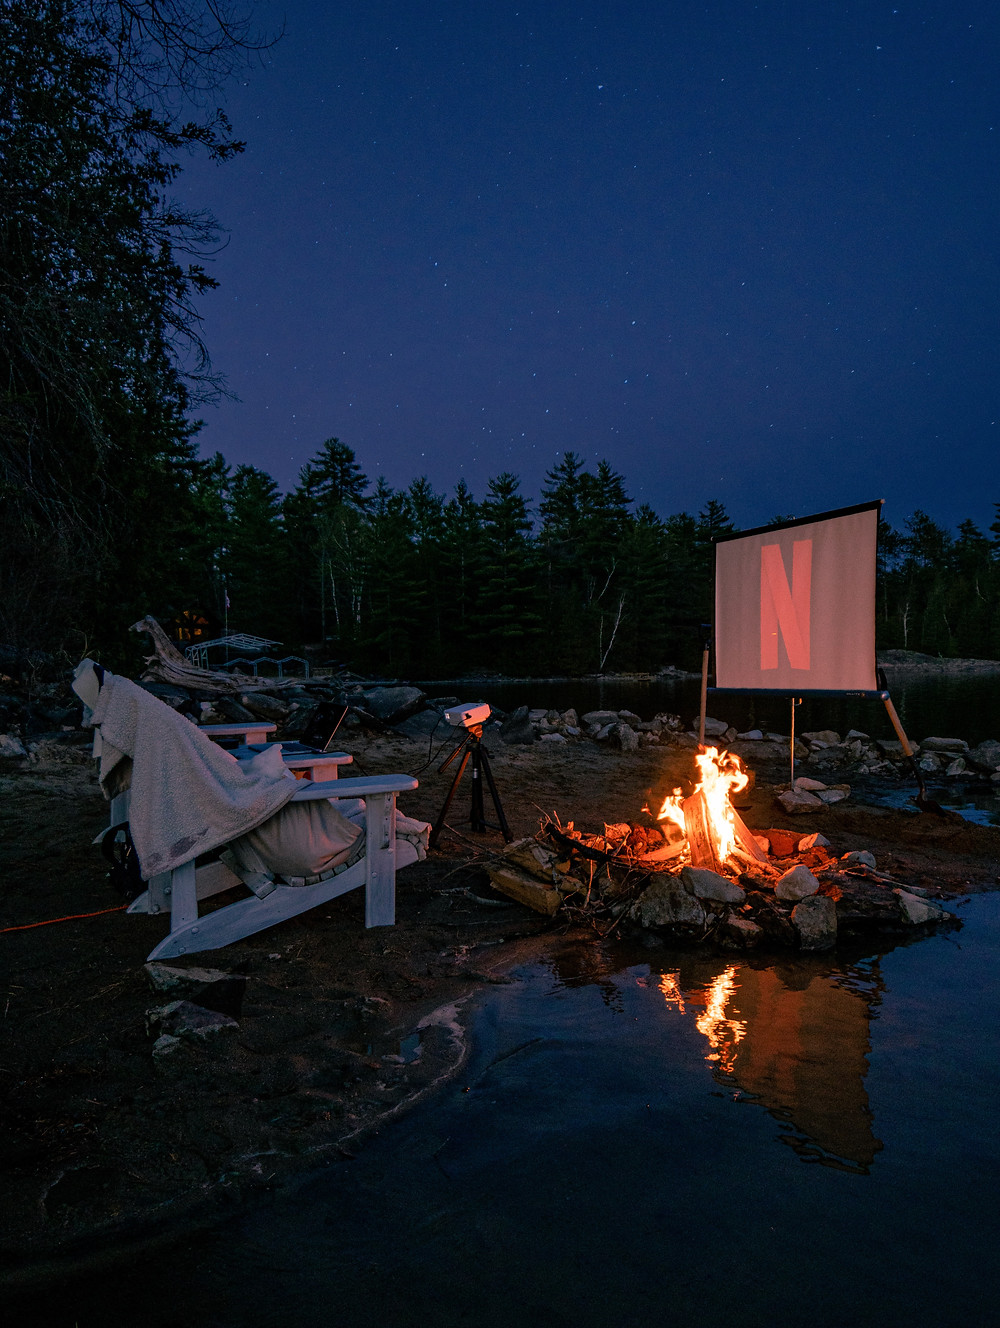 Movie ideas, Netflix, movie nights